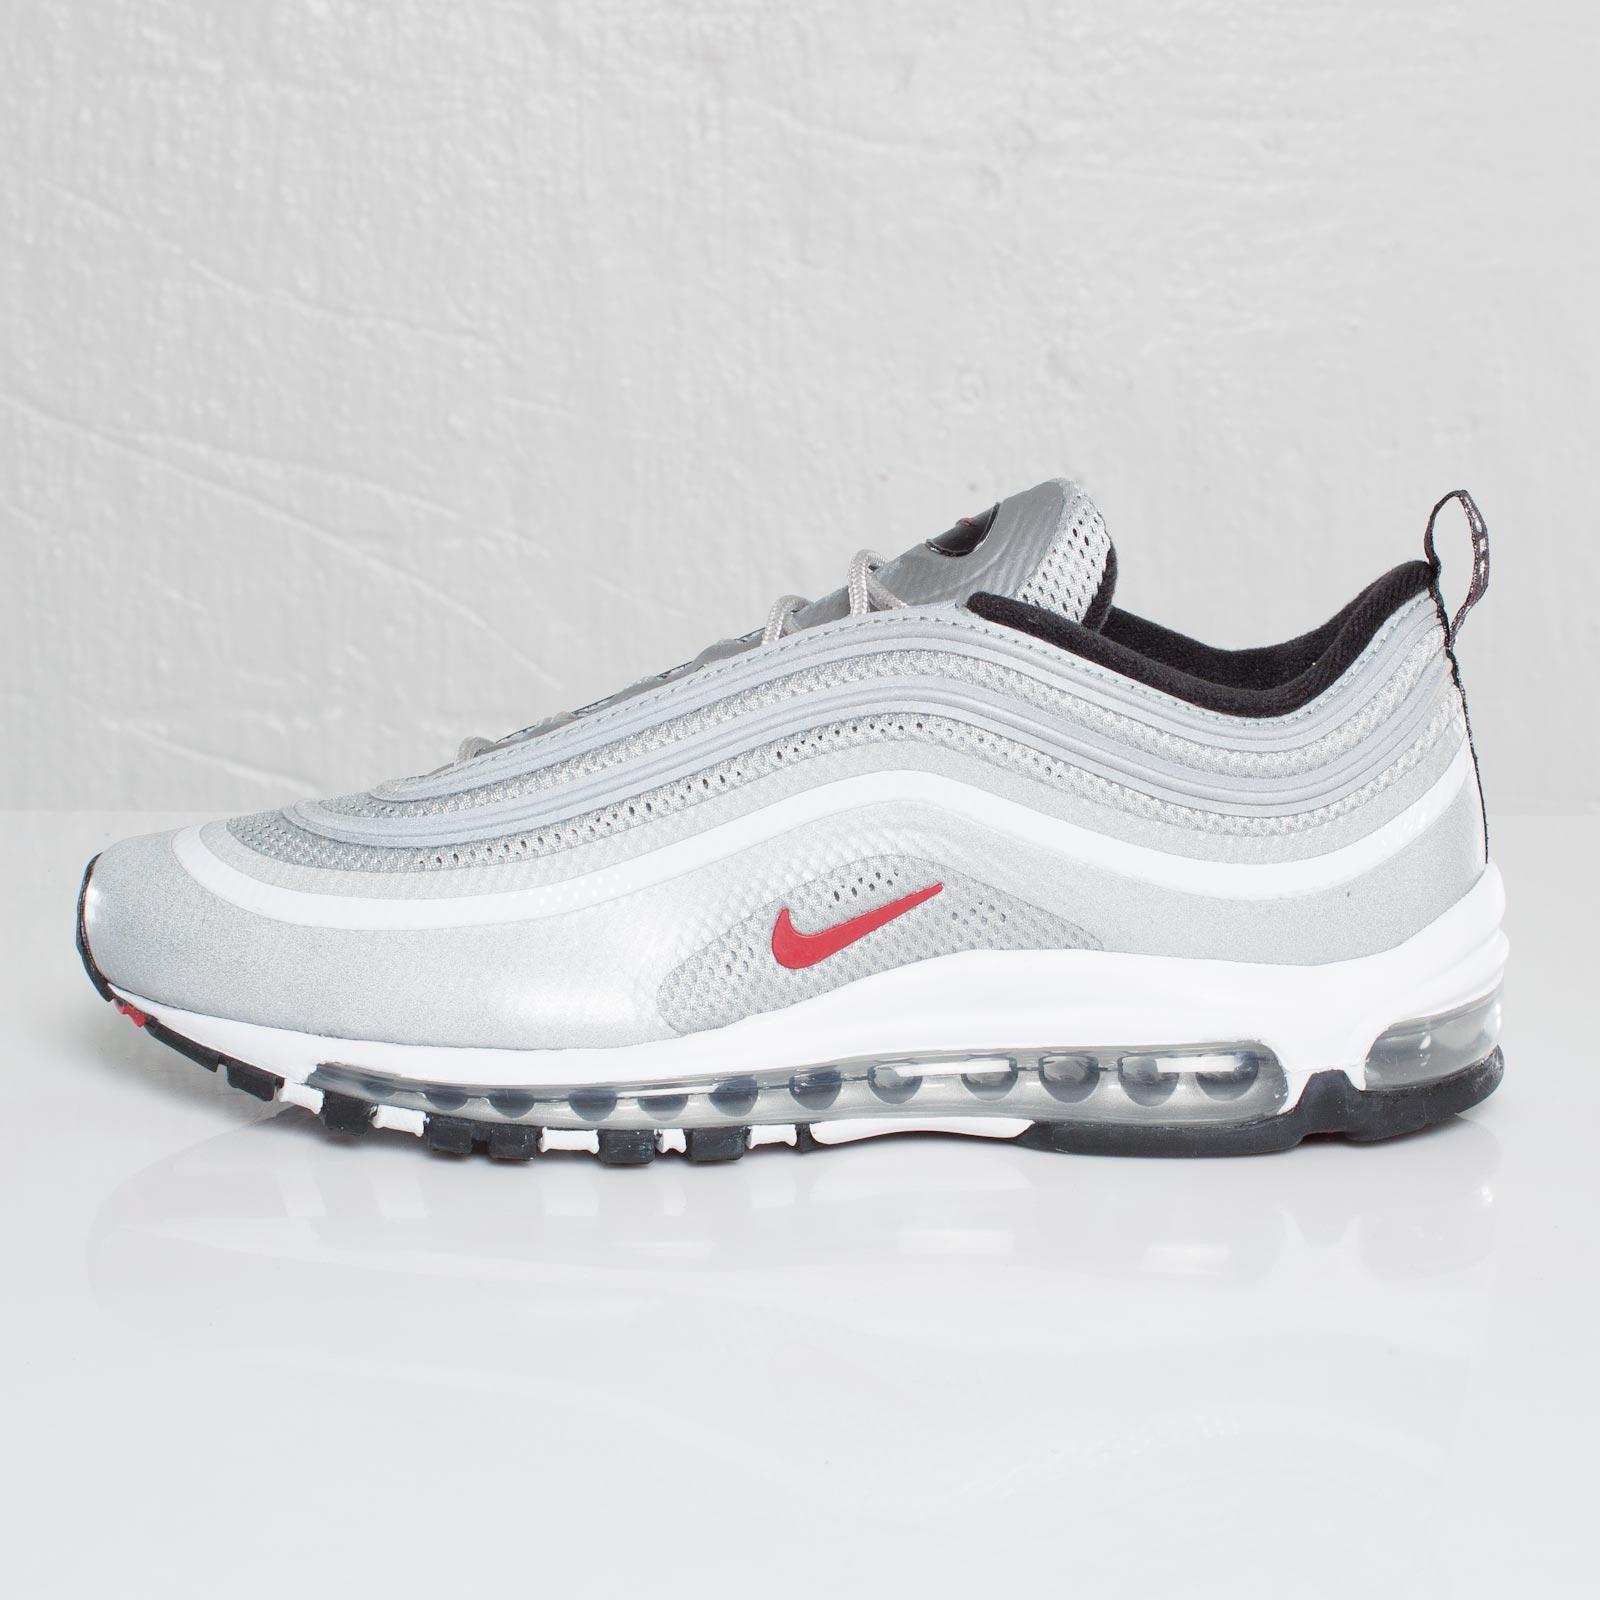 18eab8b877 Nike Air Max 97 Premium NRG - 542427-060 - Sneakersnstuff | sneakers ...